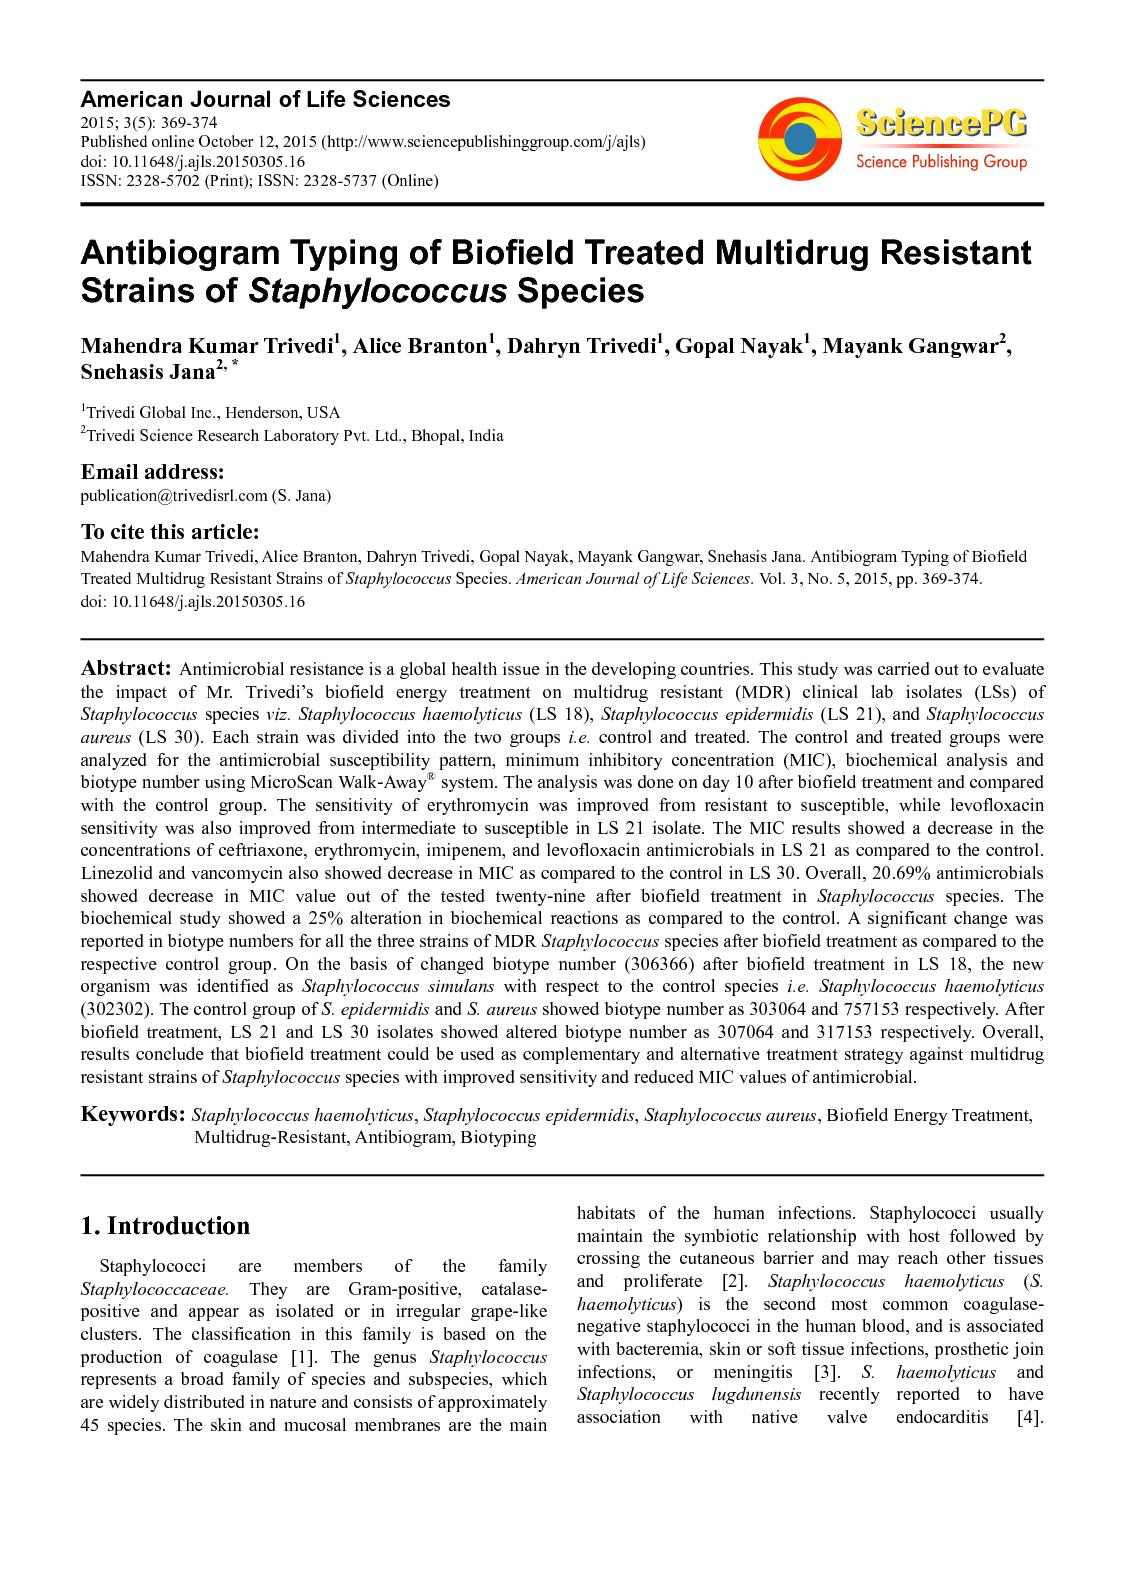 Calaméo - Trivedi Effect - Antibiogram Typing of Biofield Treated